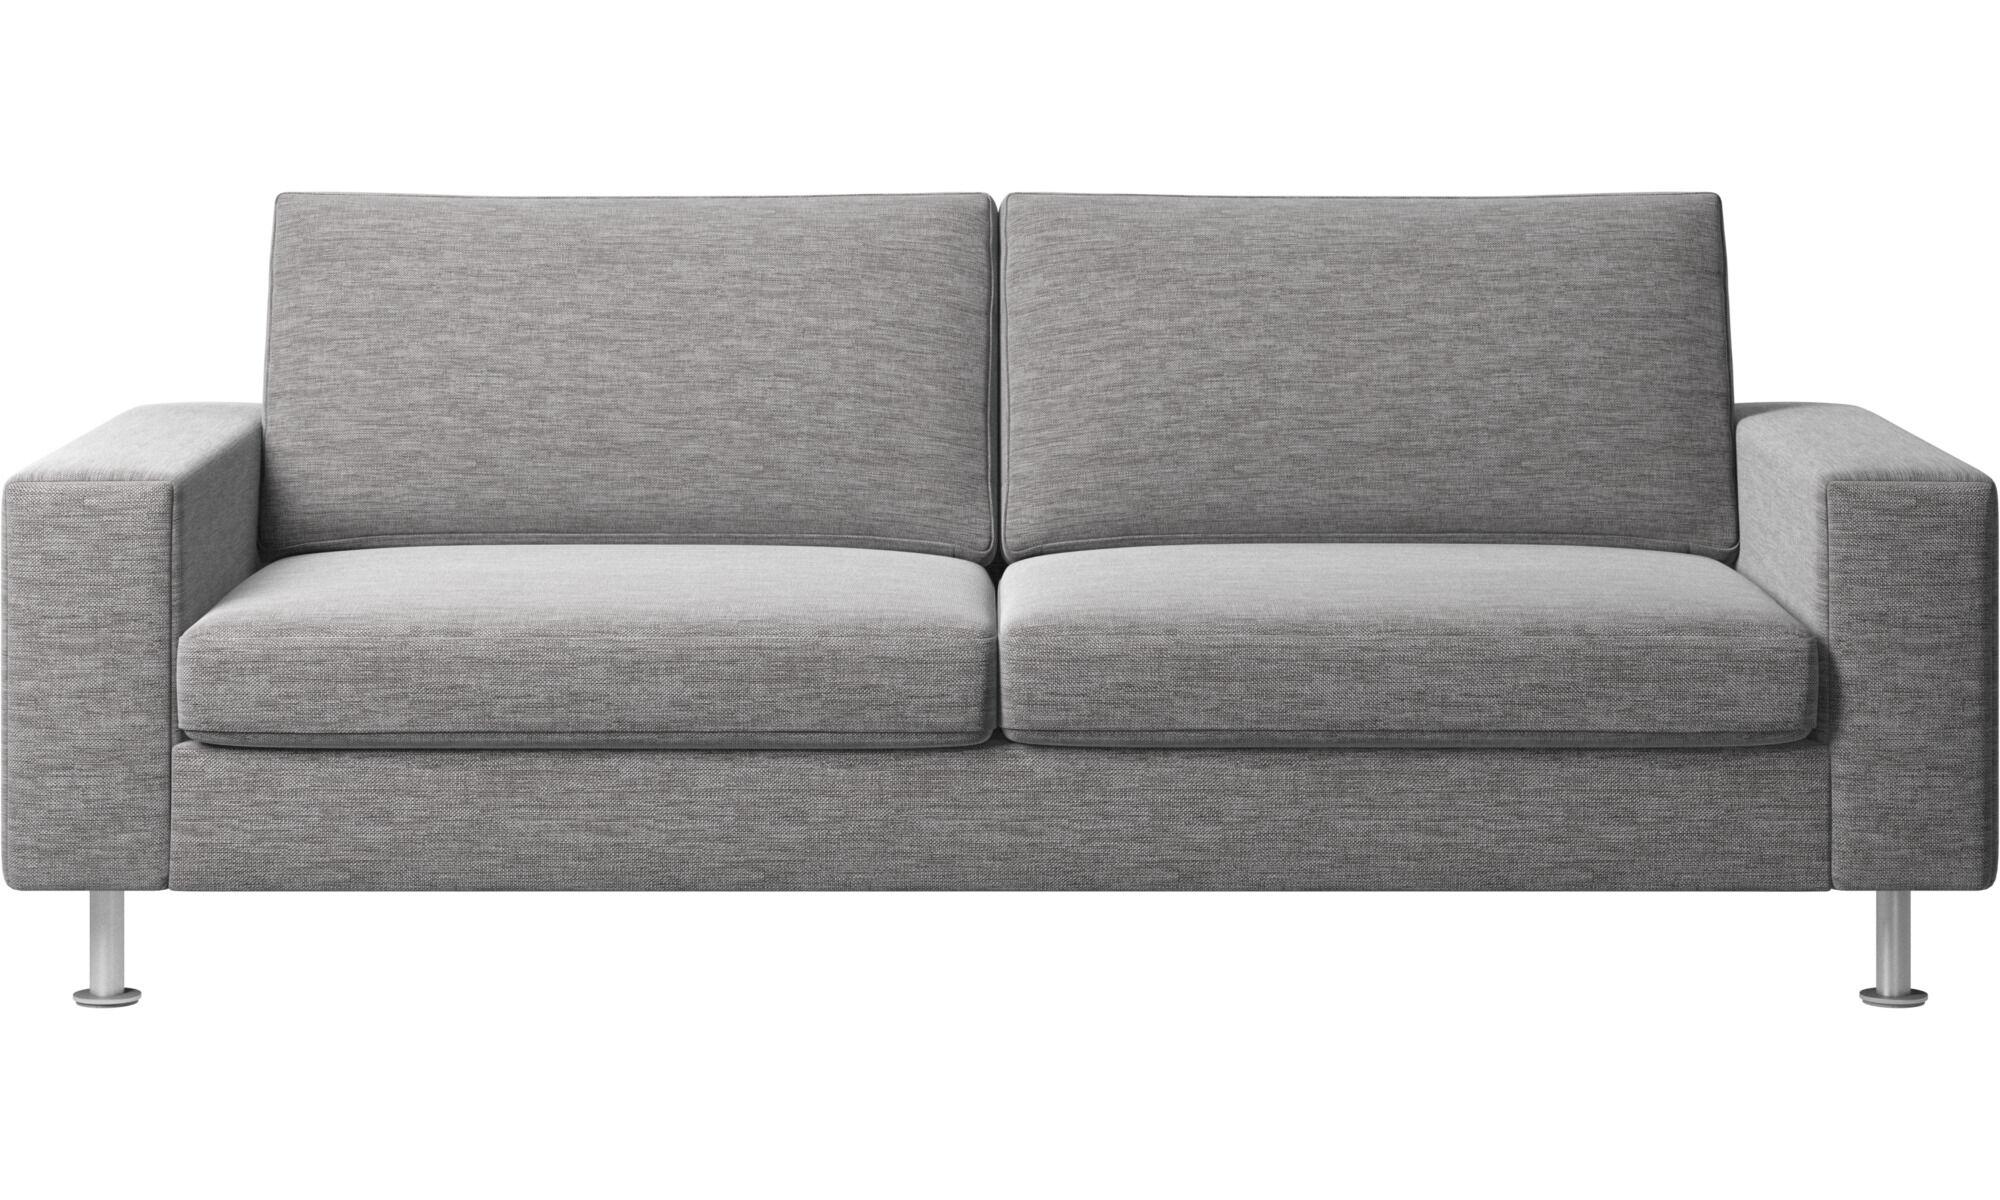 Sofa Beds   Indivi 2 Sofa Bed   Gray   Fabric